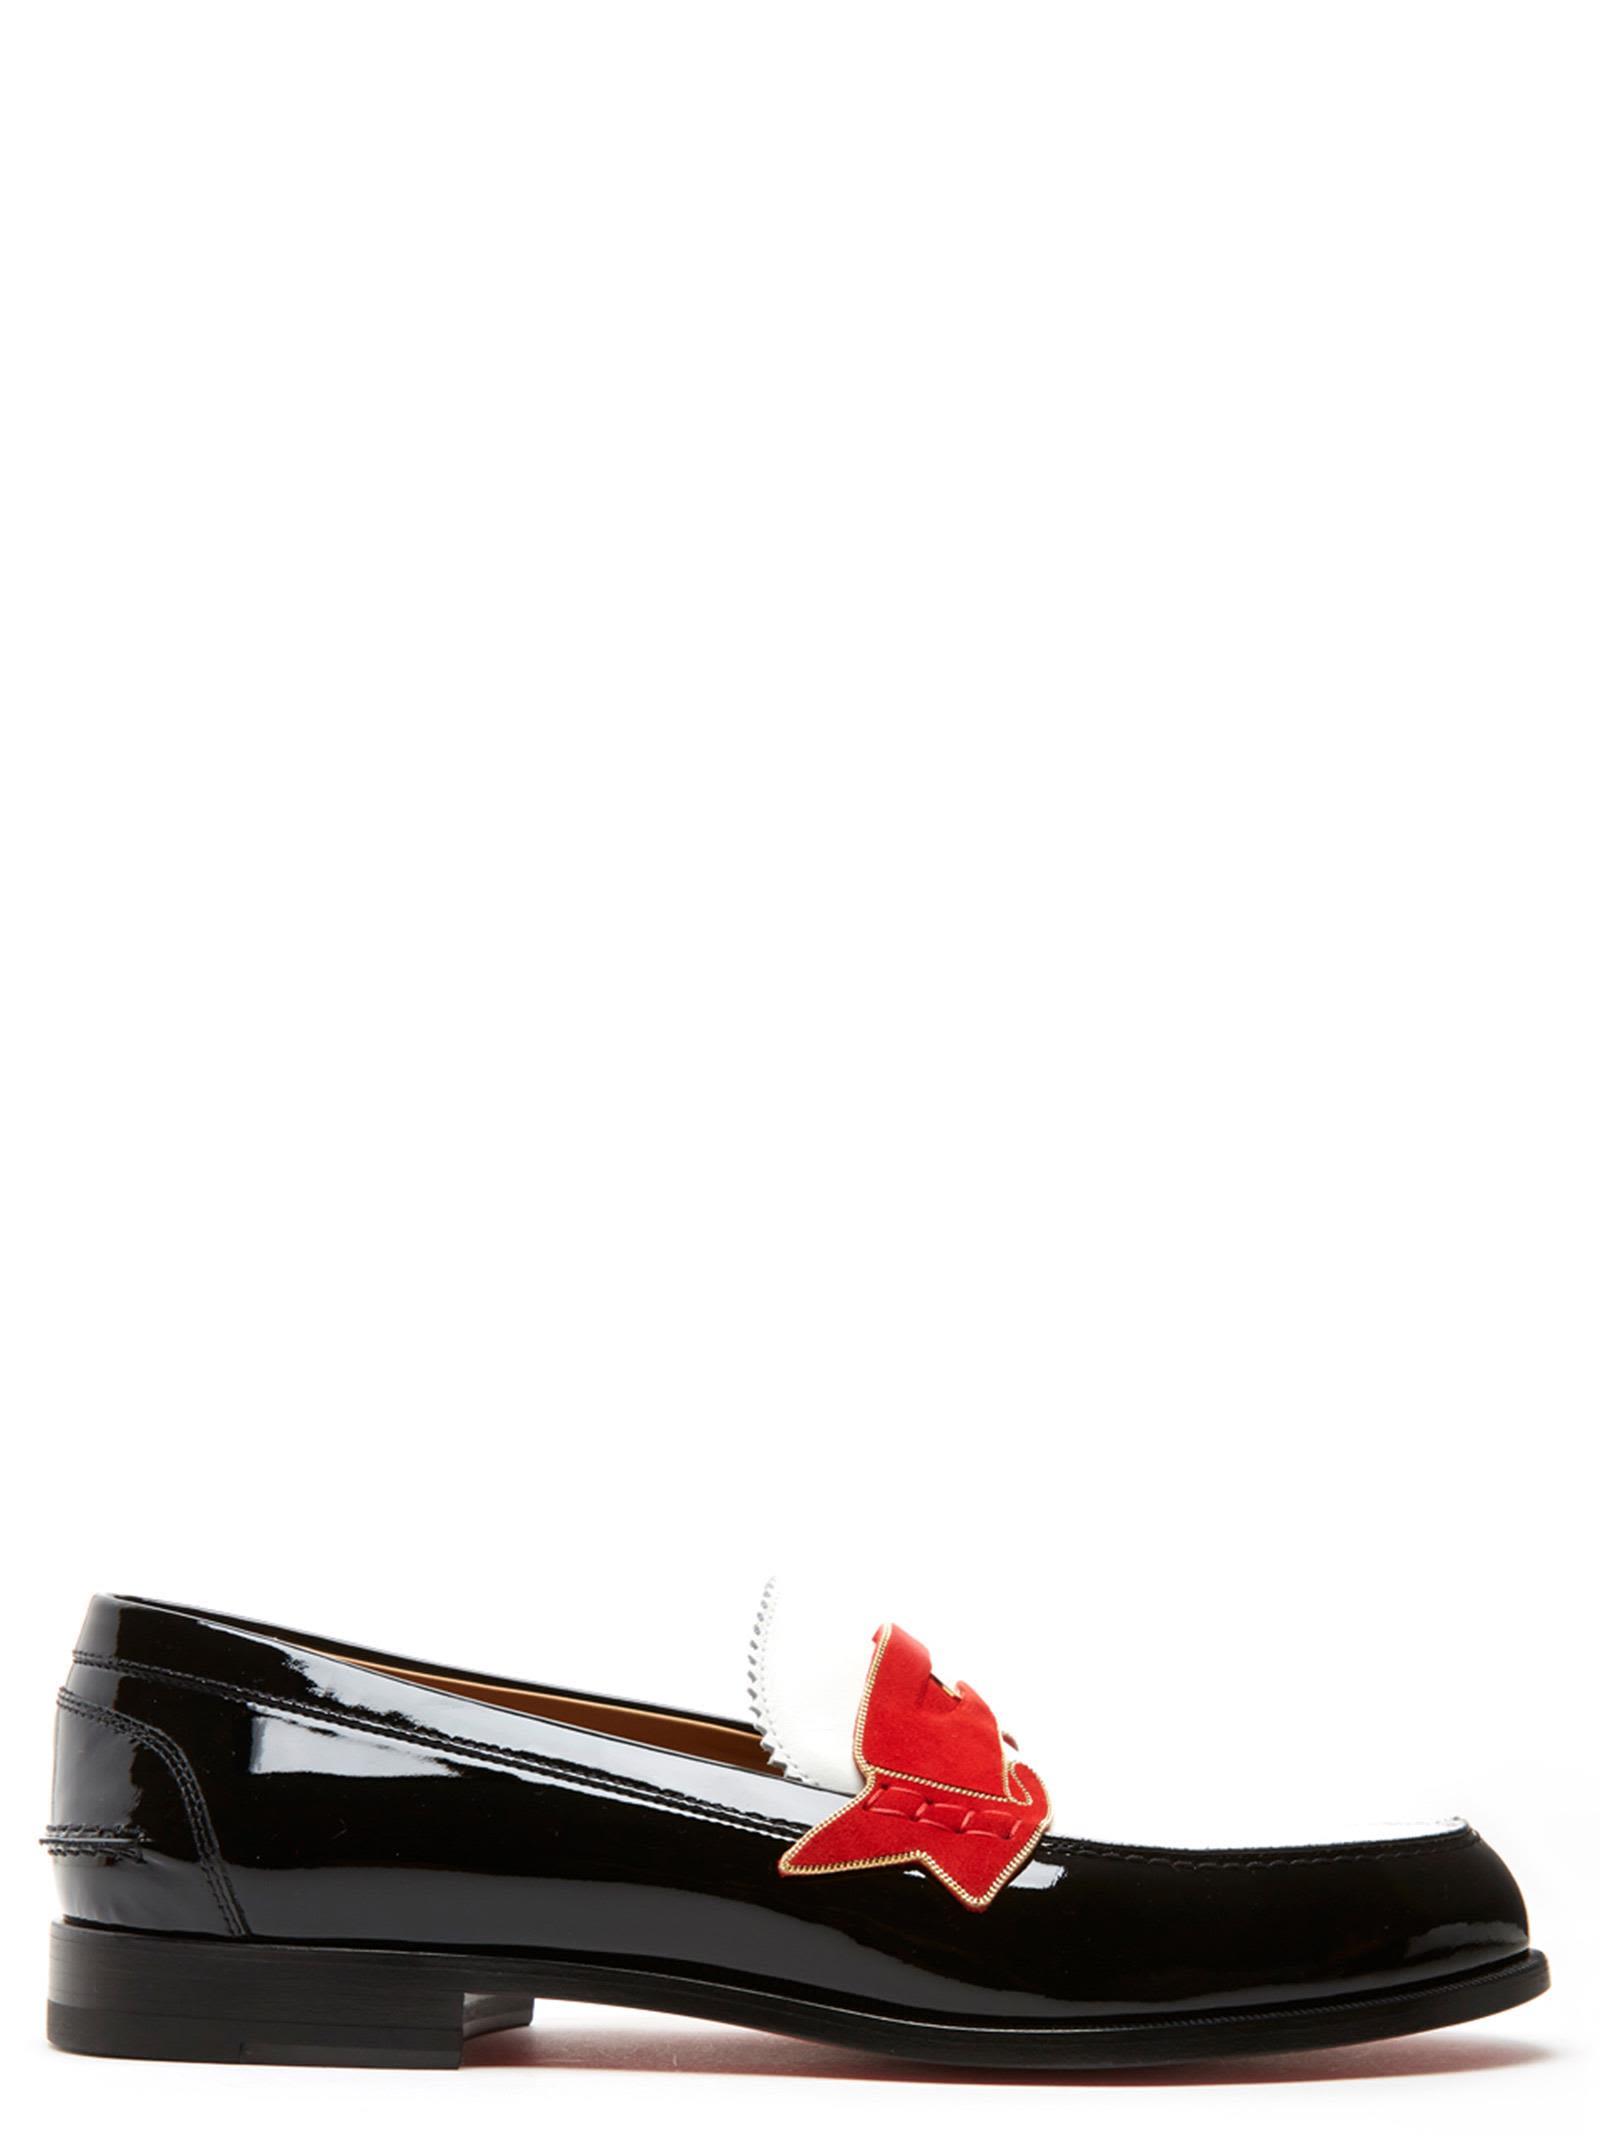 Christian Louboutin 'monono' Shoes